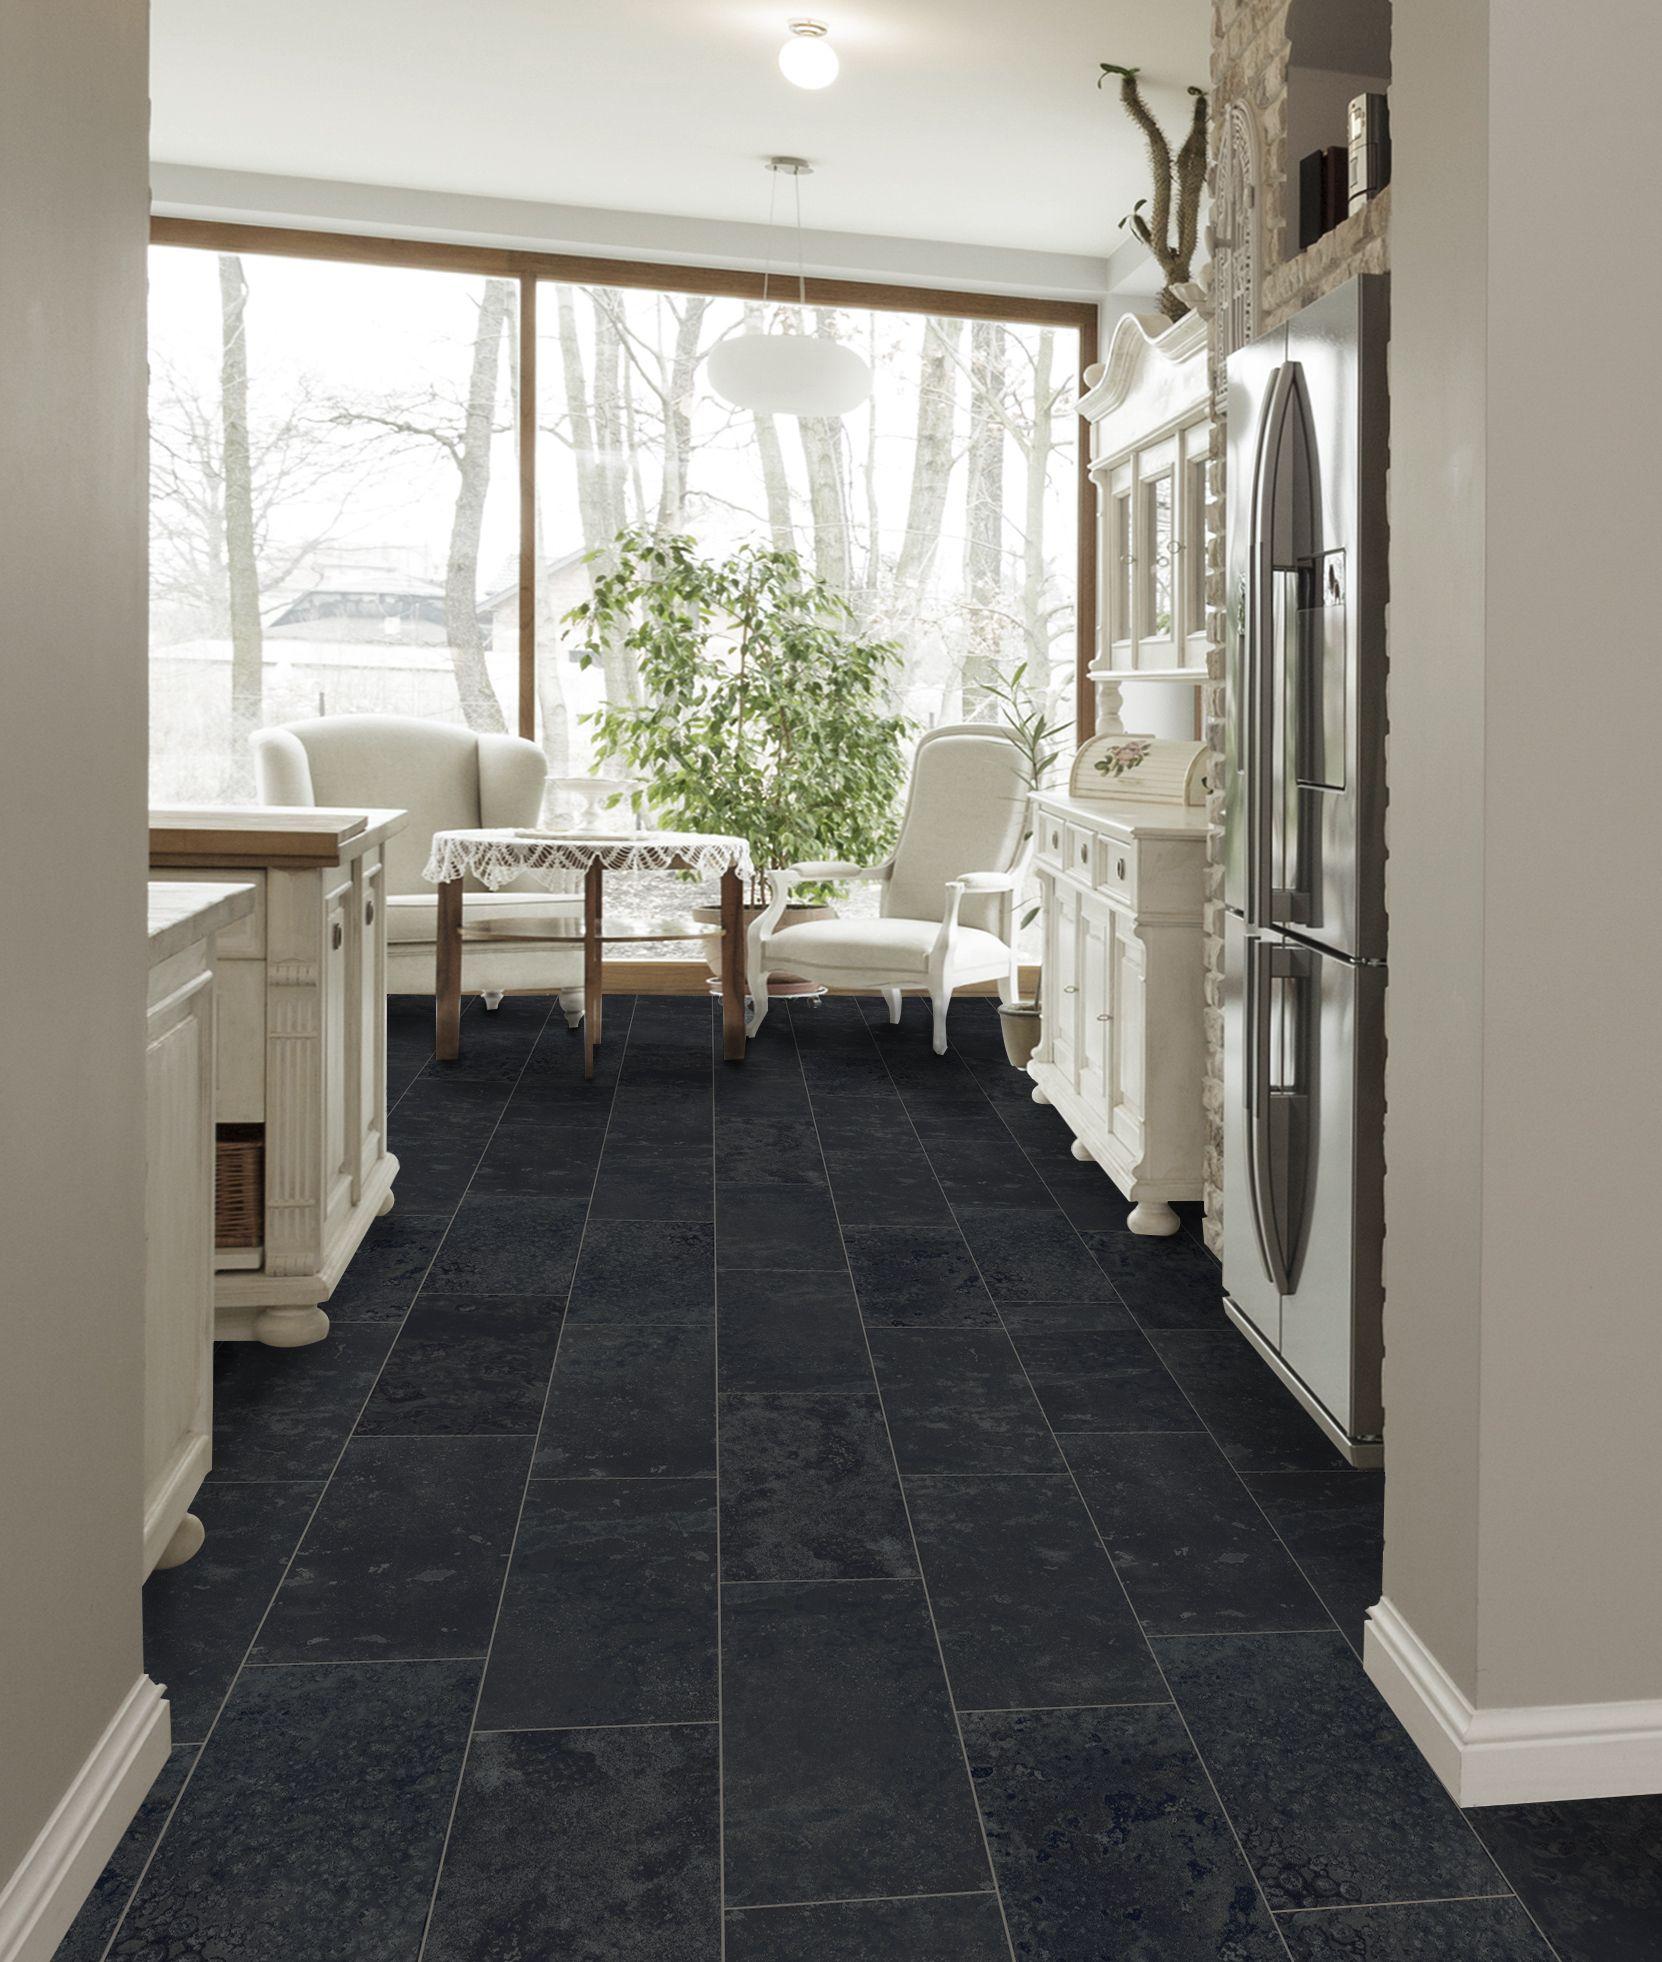 Style Selections Amazon Black 12 In X 24 In Glazed Porcelain Slate Tile Lowes Com White Tiles Black Slate Tiles Black And White Tiles